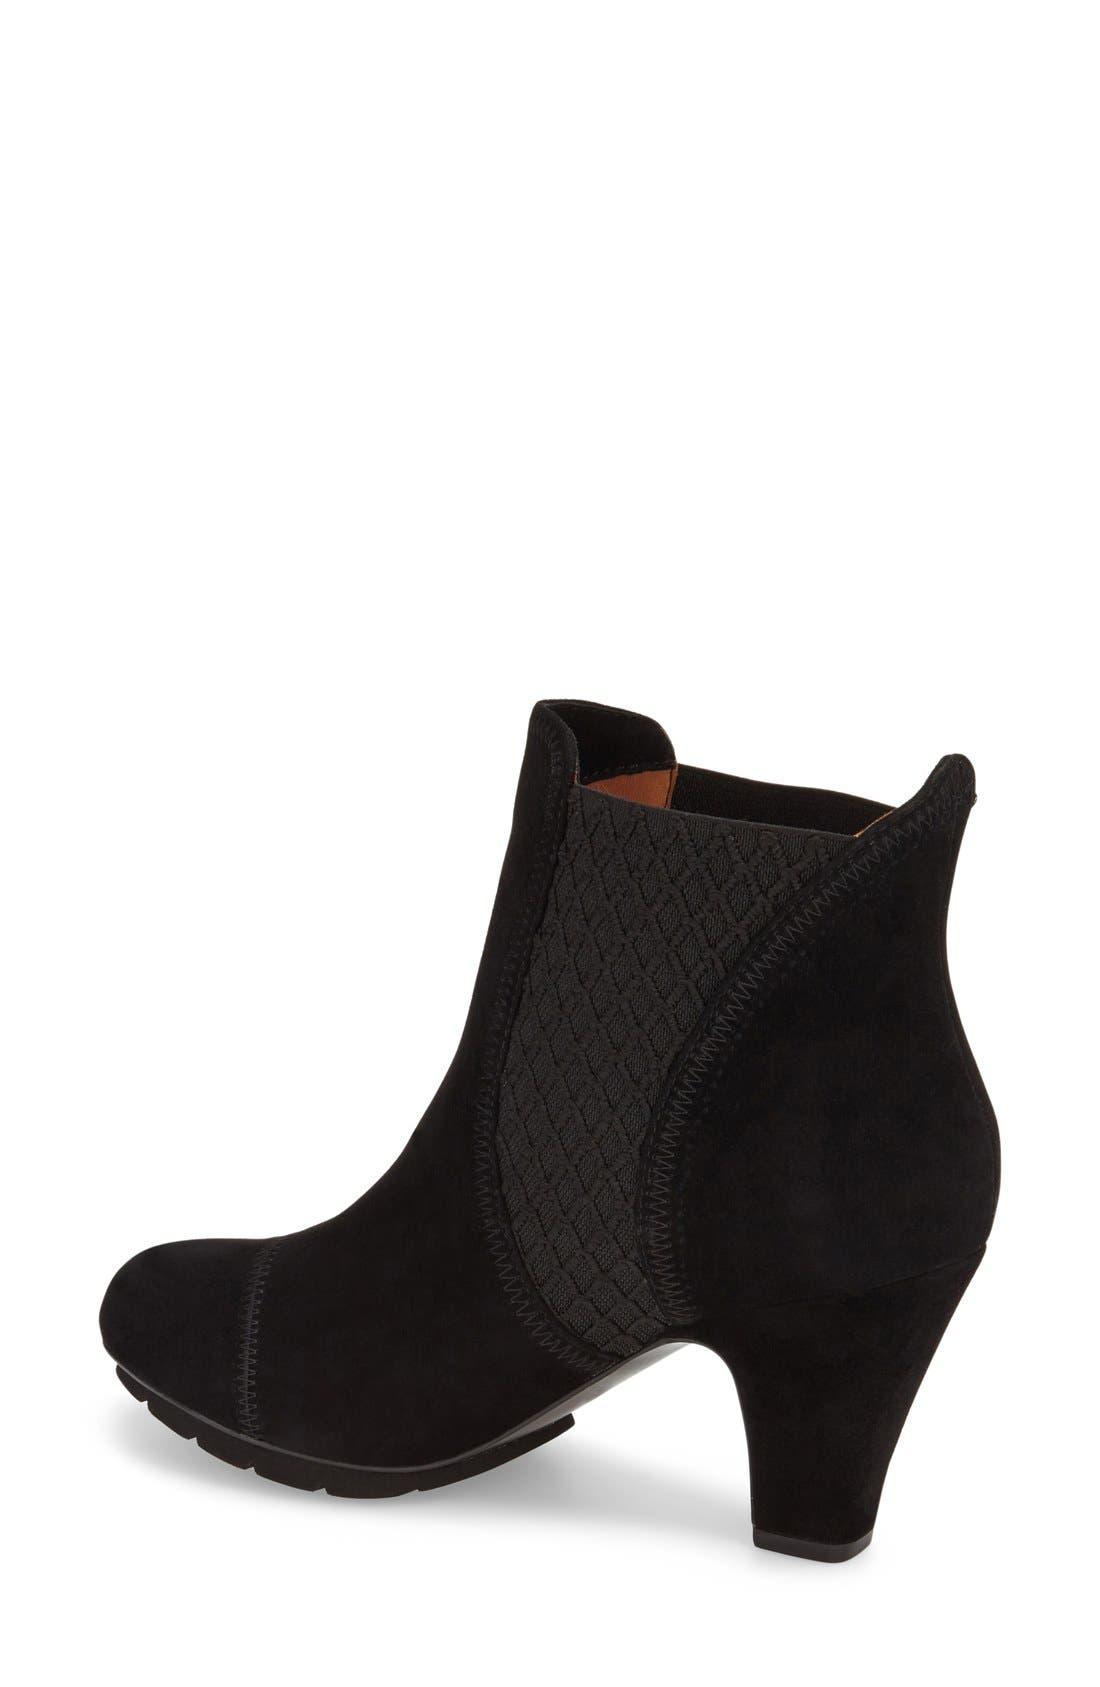 Alternate Image 2  - L'Amourdes Pieds'Faaris' Chelsea Boot (Women)